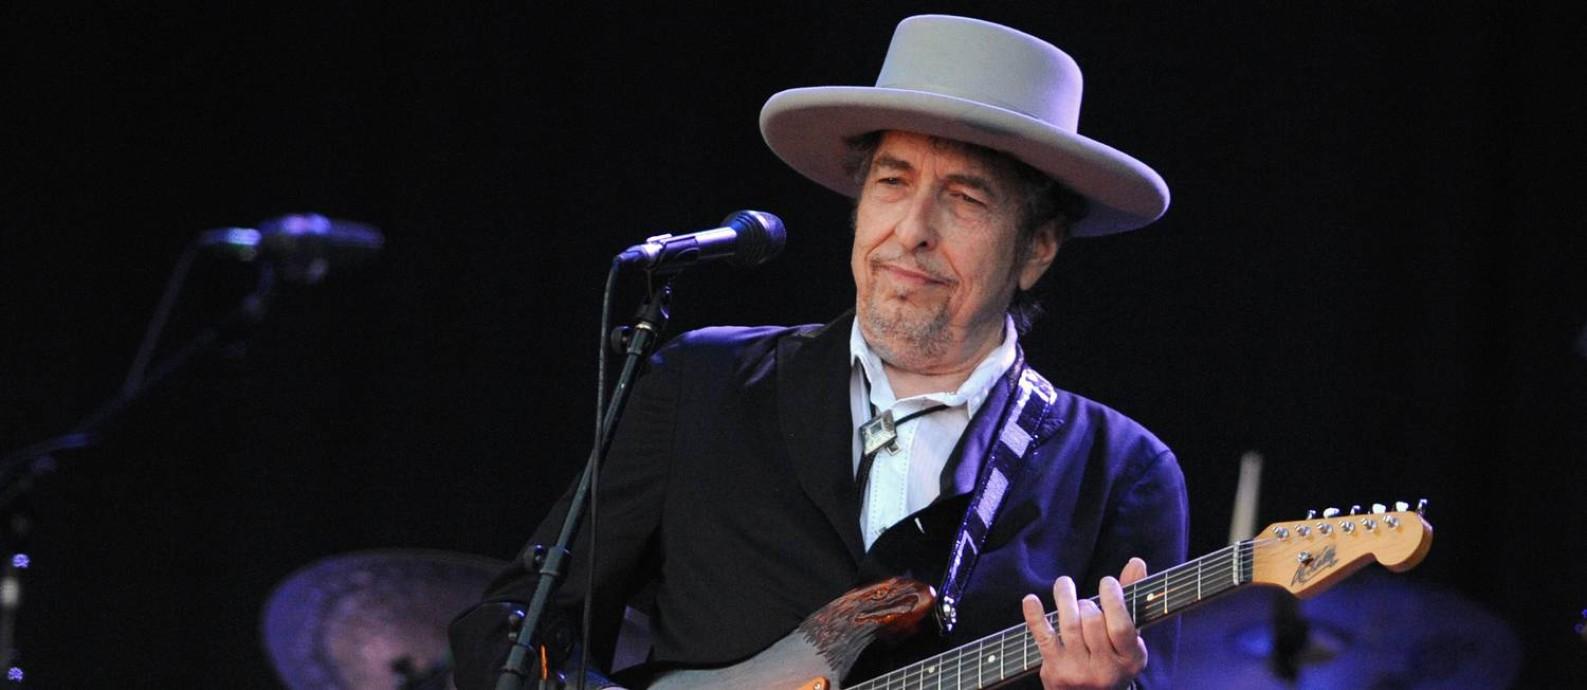 O cantor Bob Dylan Foto: / AFP / FRED TANNEAU